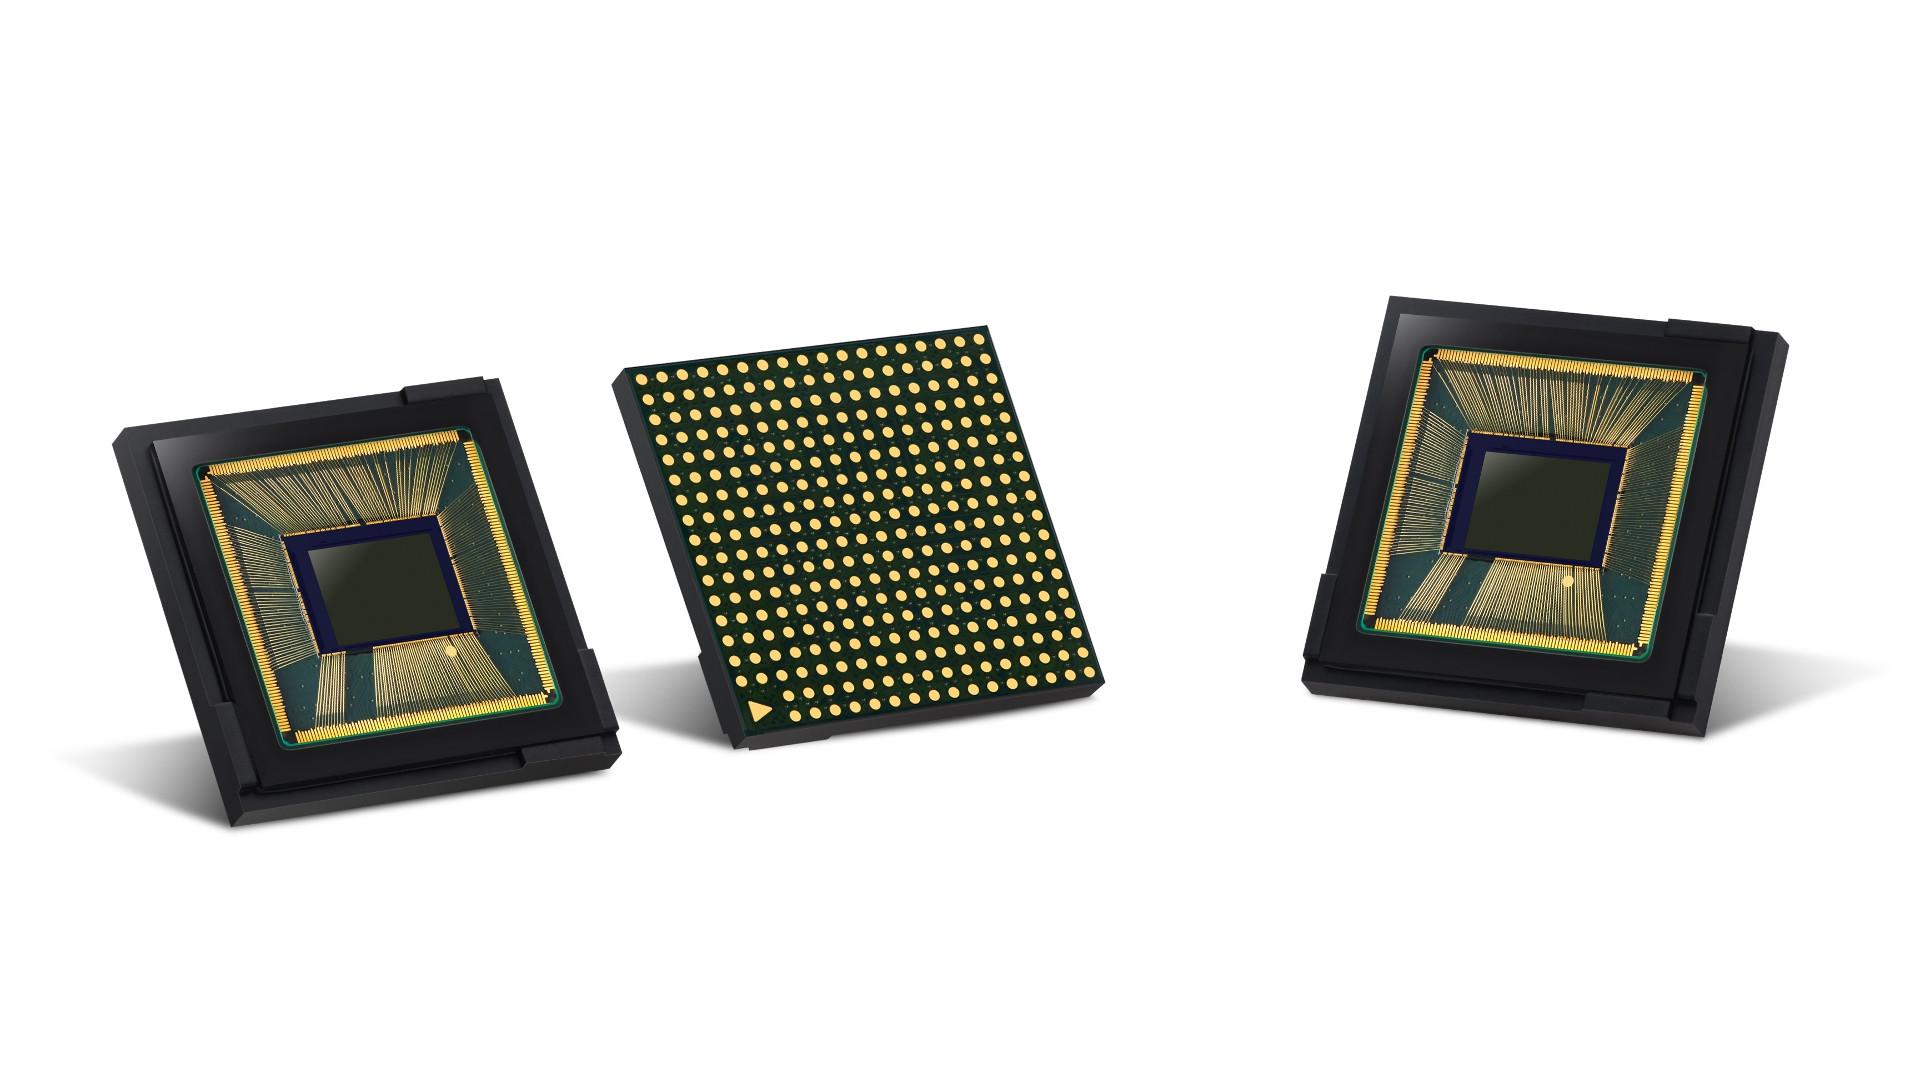 The Samsung ISOCELL Fast 2L3 camera sensor.